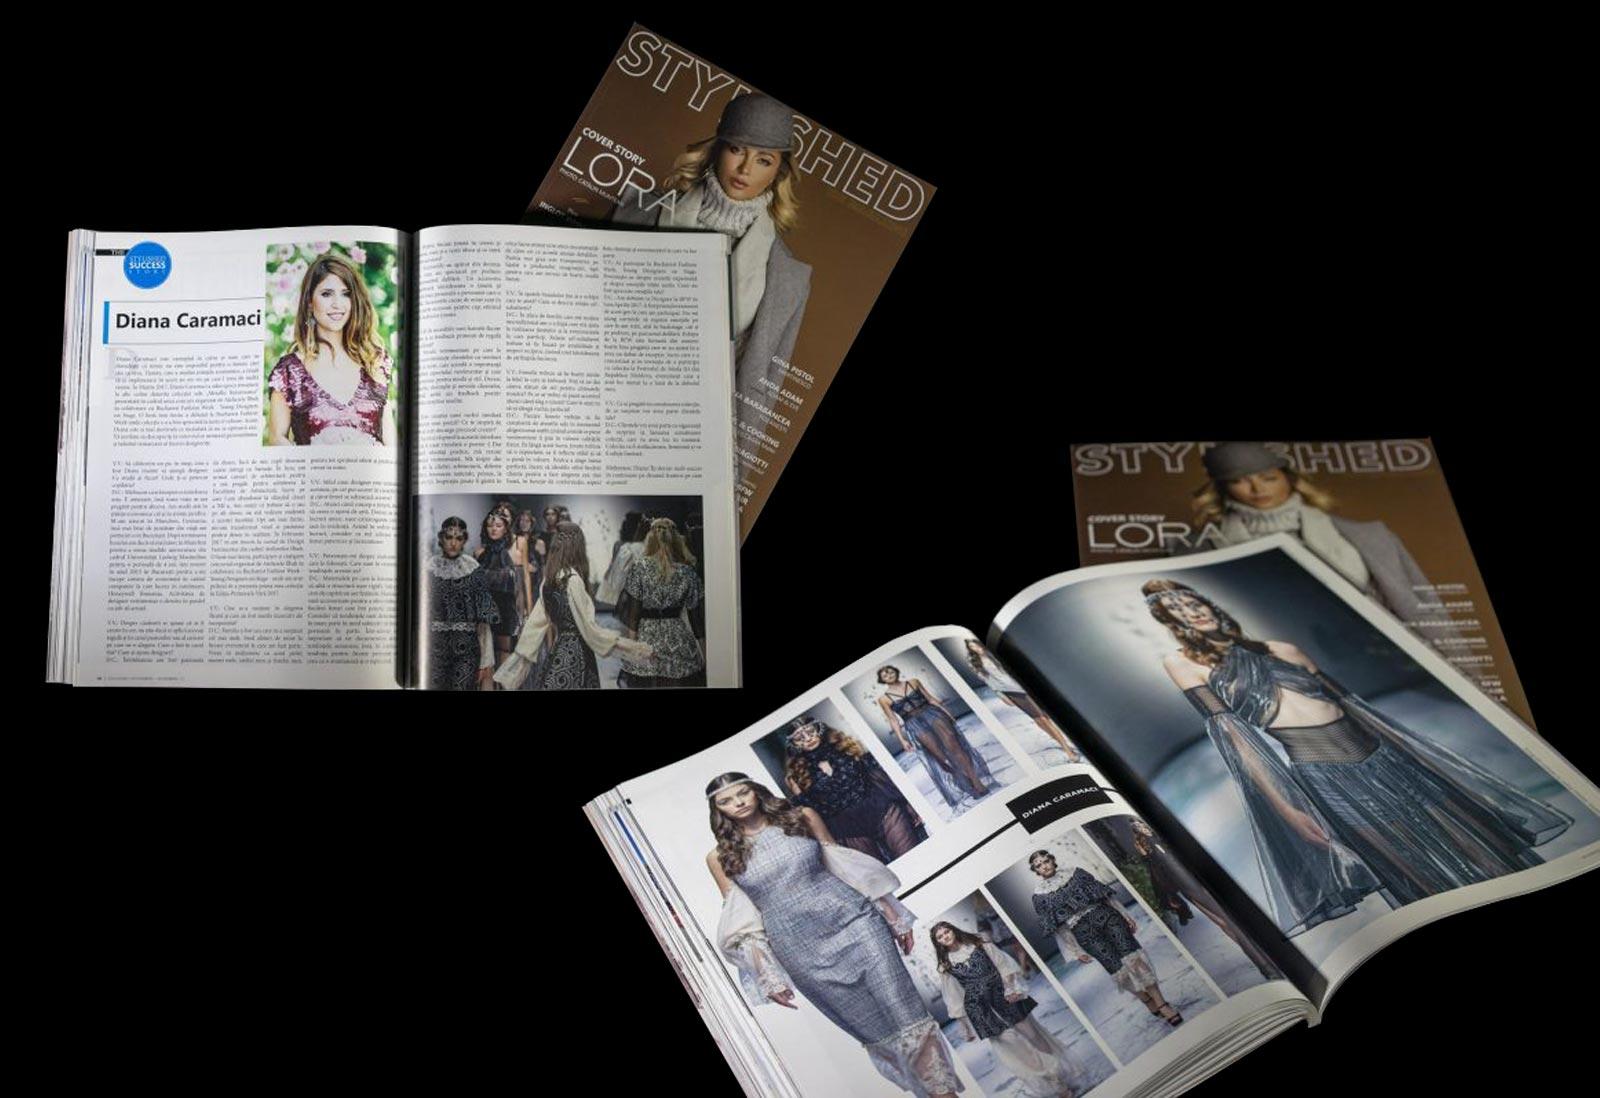 diana-caramaci-stylished-success-story